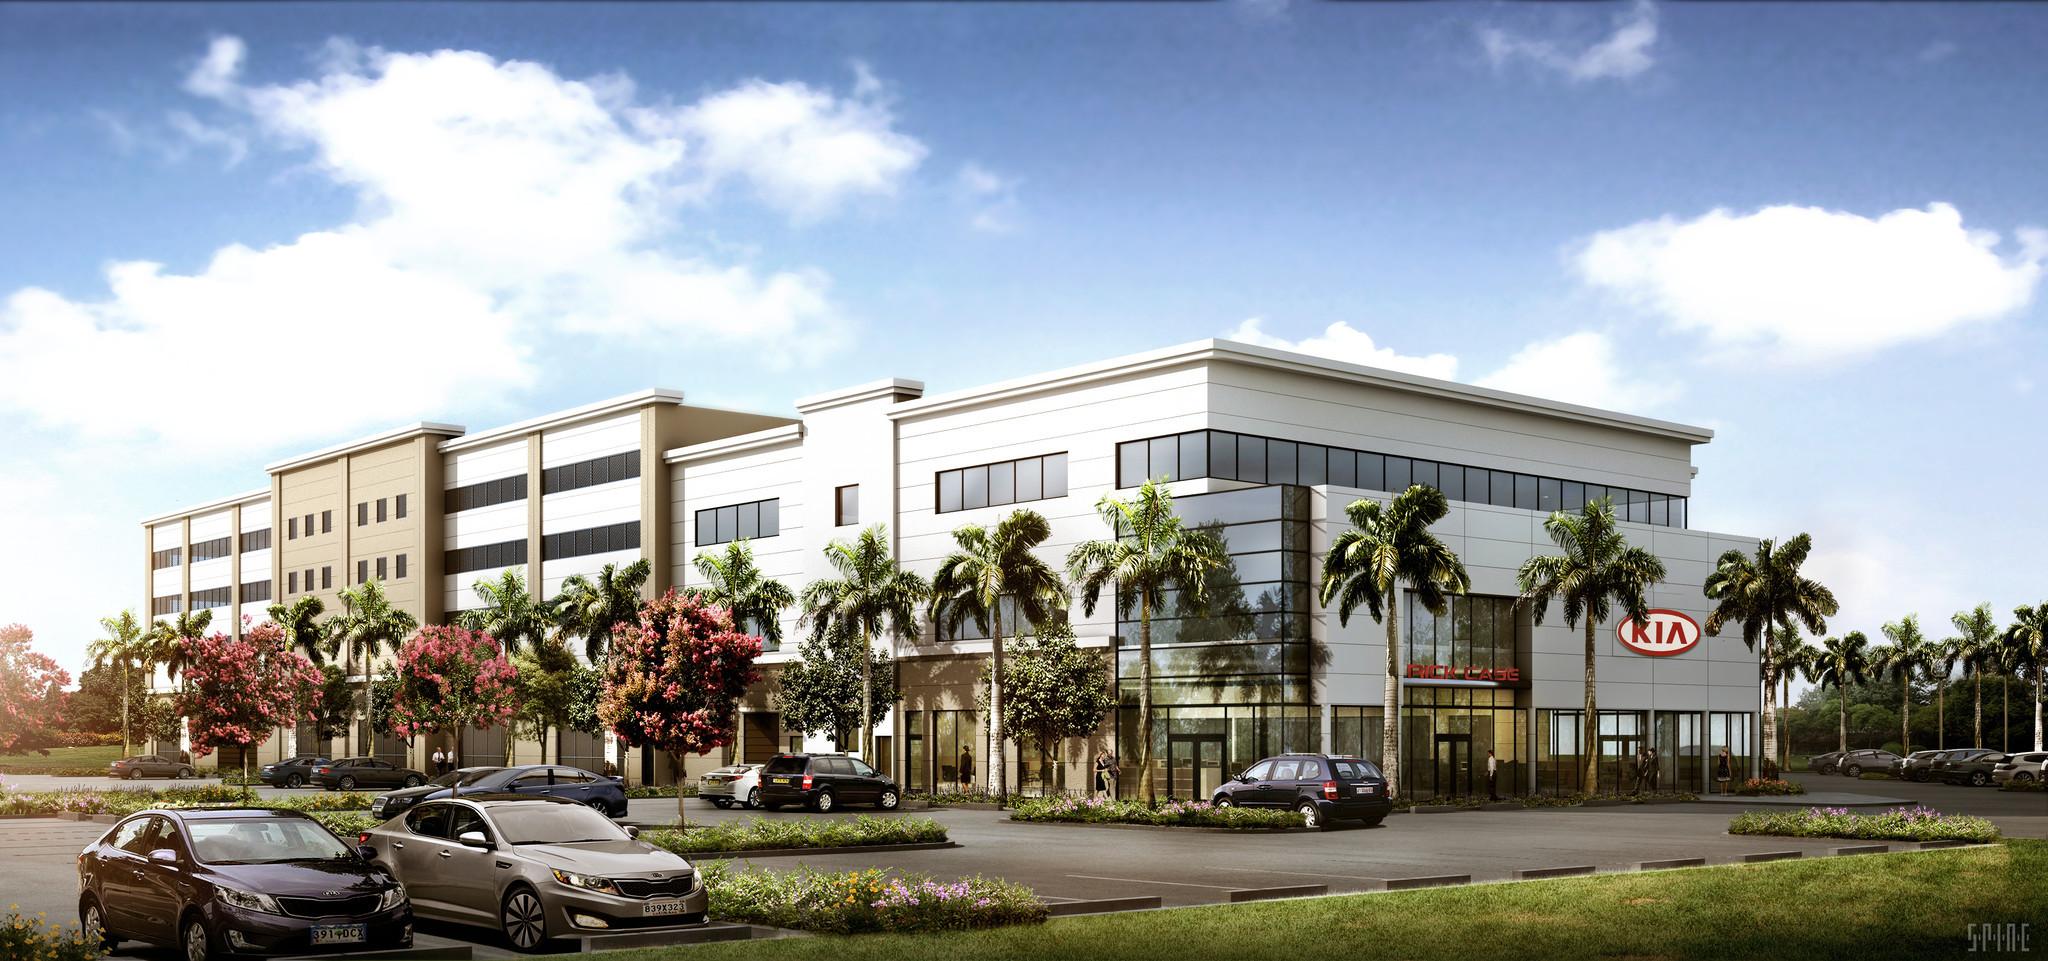 The rick case automotive group fort lauderdale florida for Honda dealership fort lauderdale